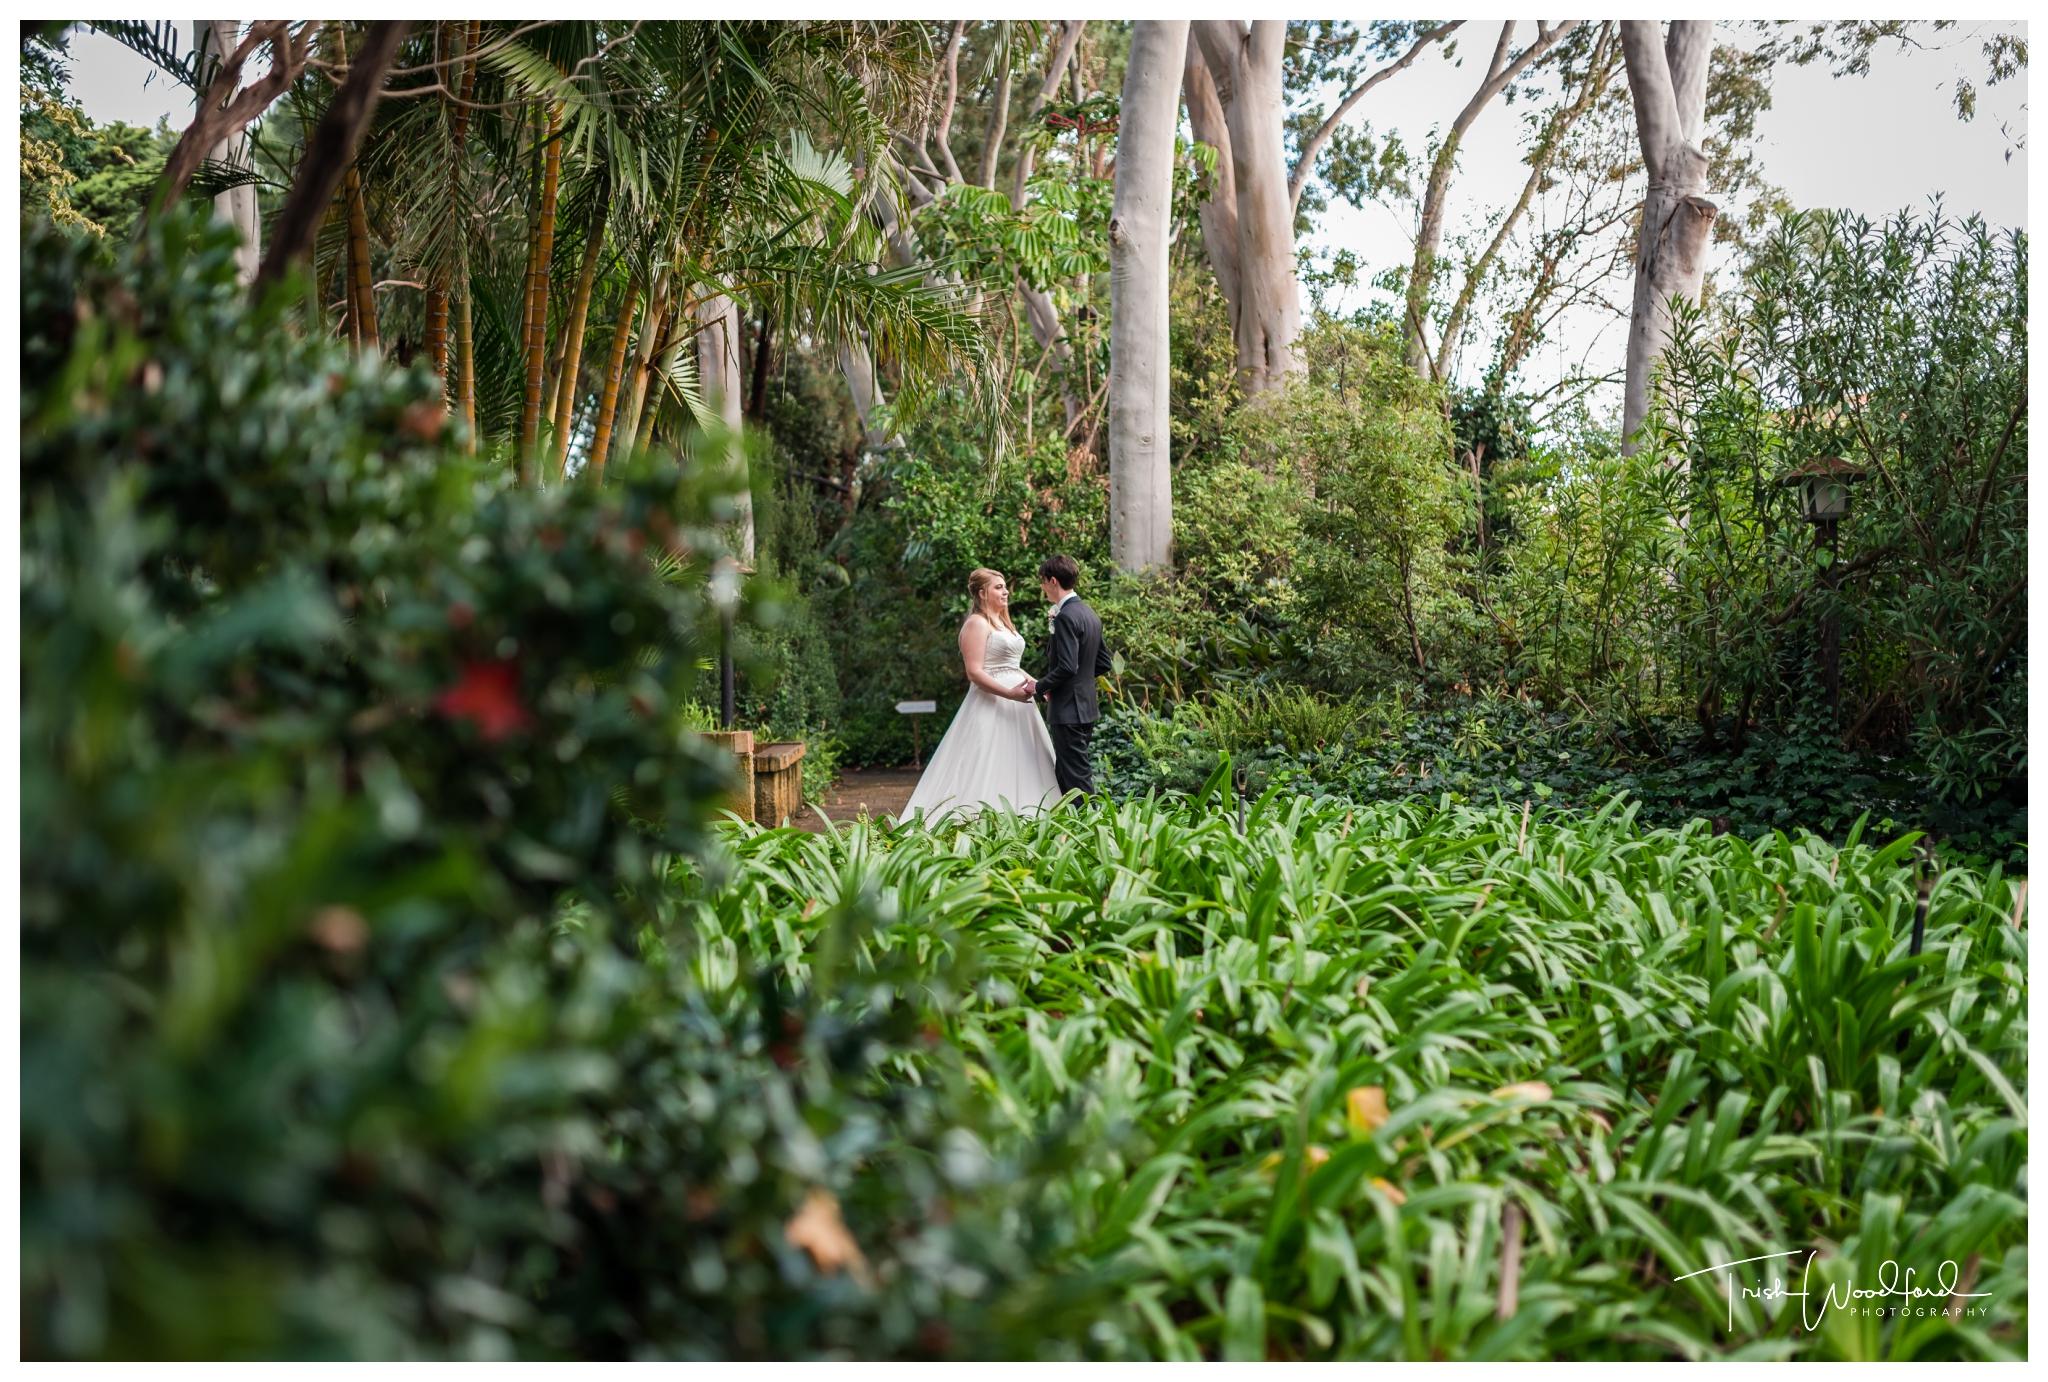 wedding-portrait-wanneroo-botanic-gardens